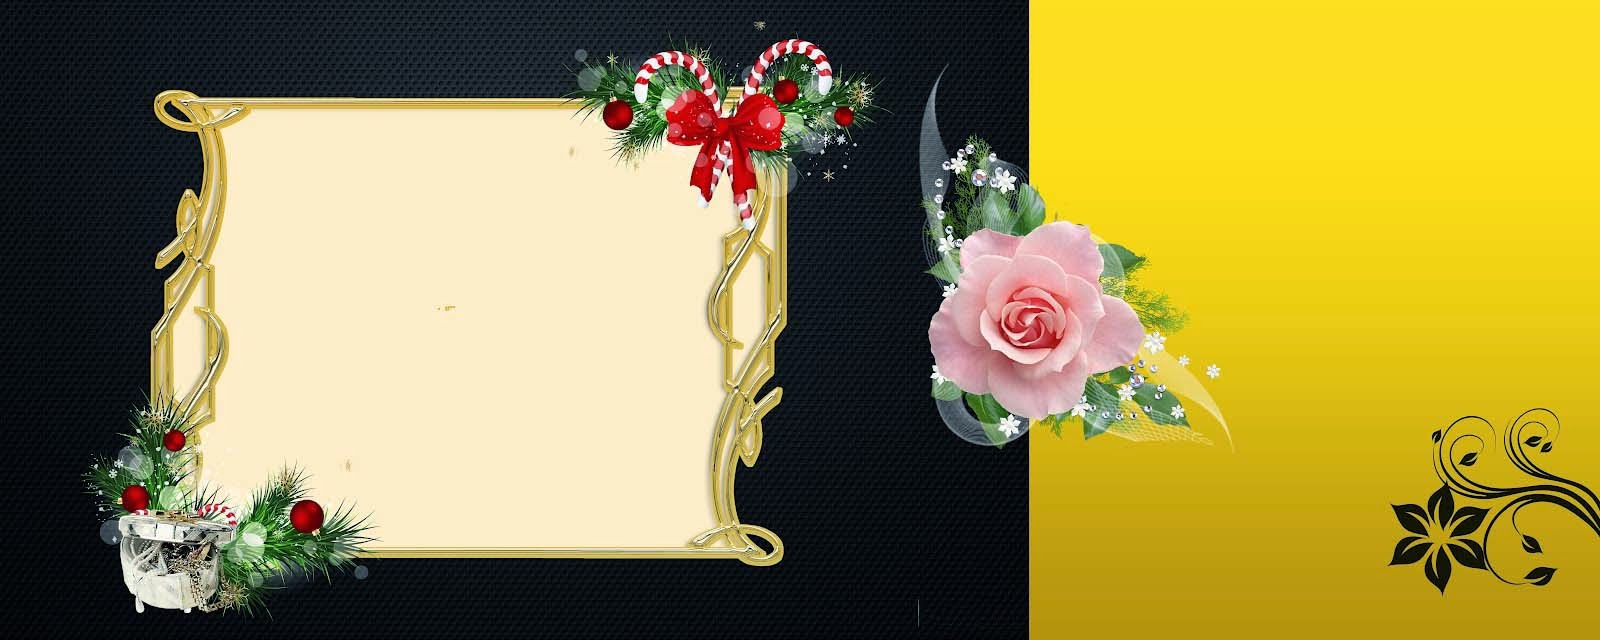 Karizma Album Background Photo Shop Design Psd Download Group B Part 8 Do You Know